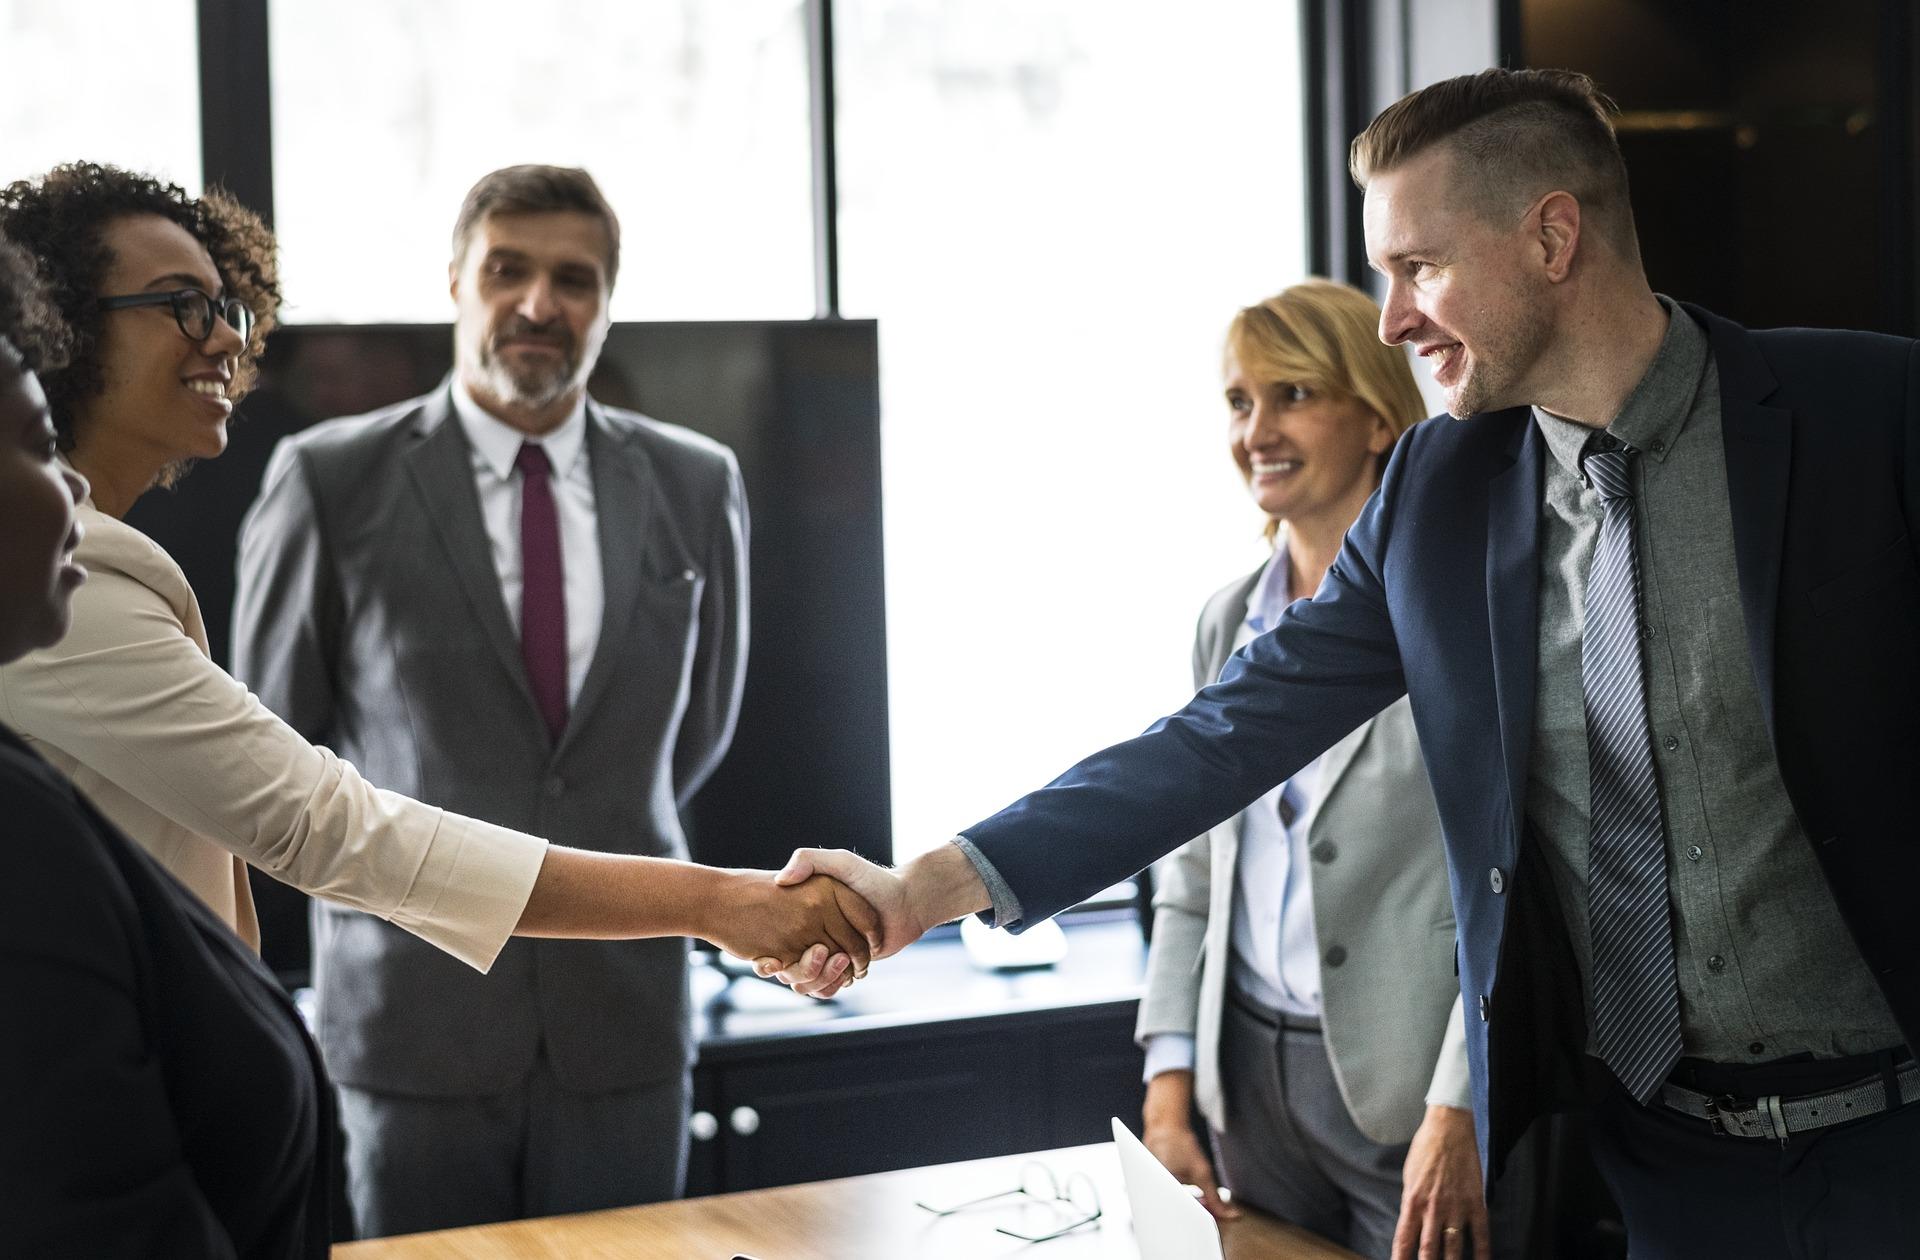 Business meeting involving a professional interpreter